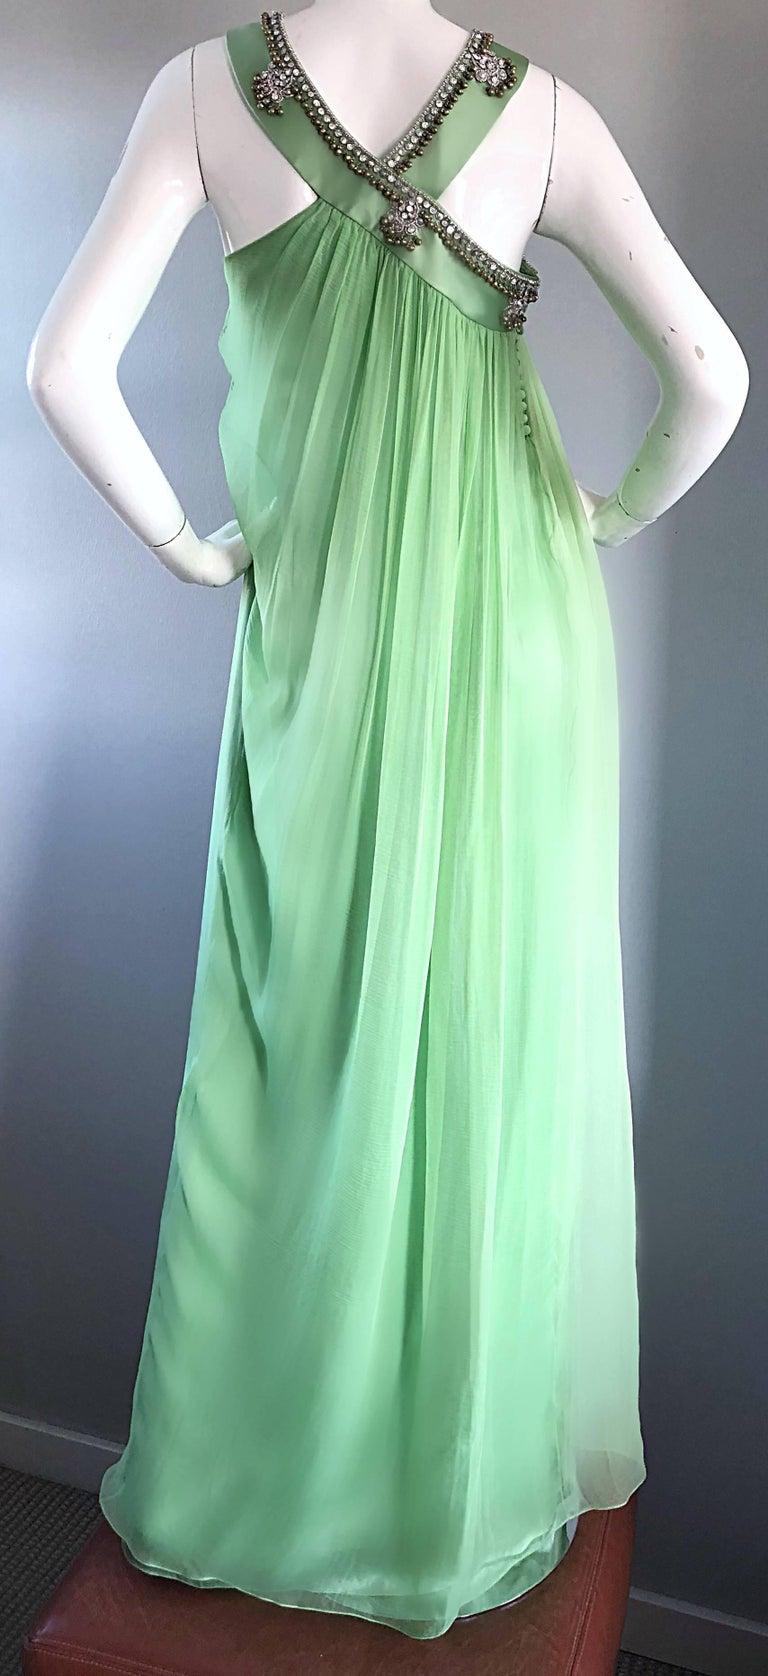 New Christian Dior John Galliano Light Green Silk Chiffon Grecian Gown, Sz 10   For Sale 5